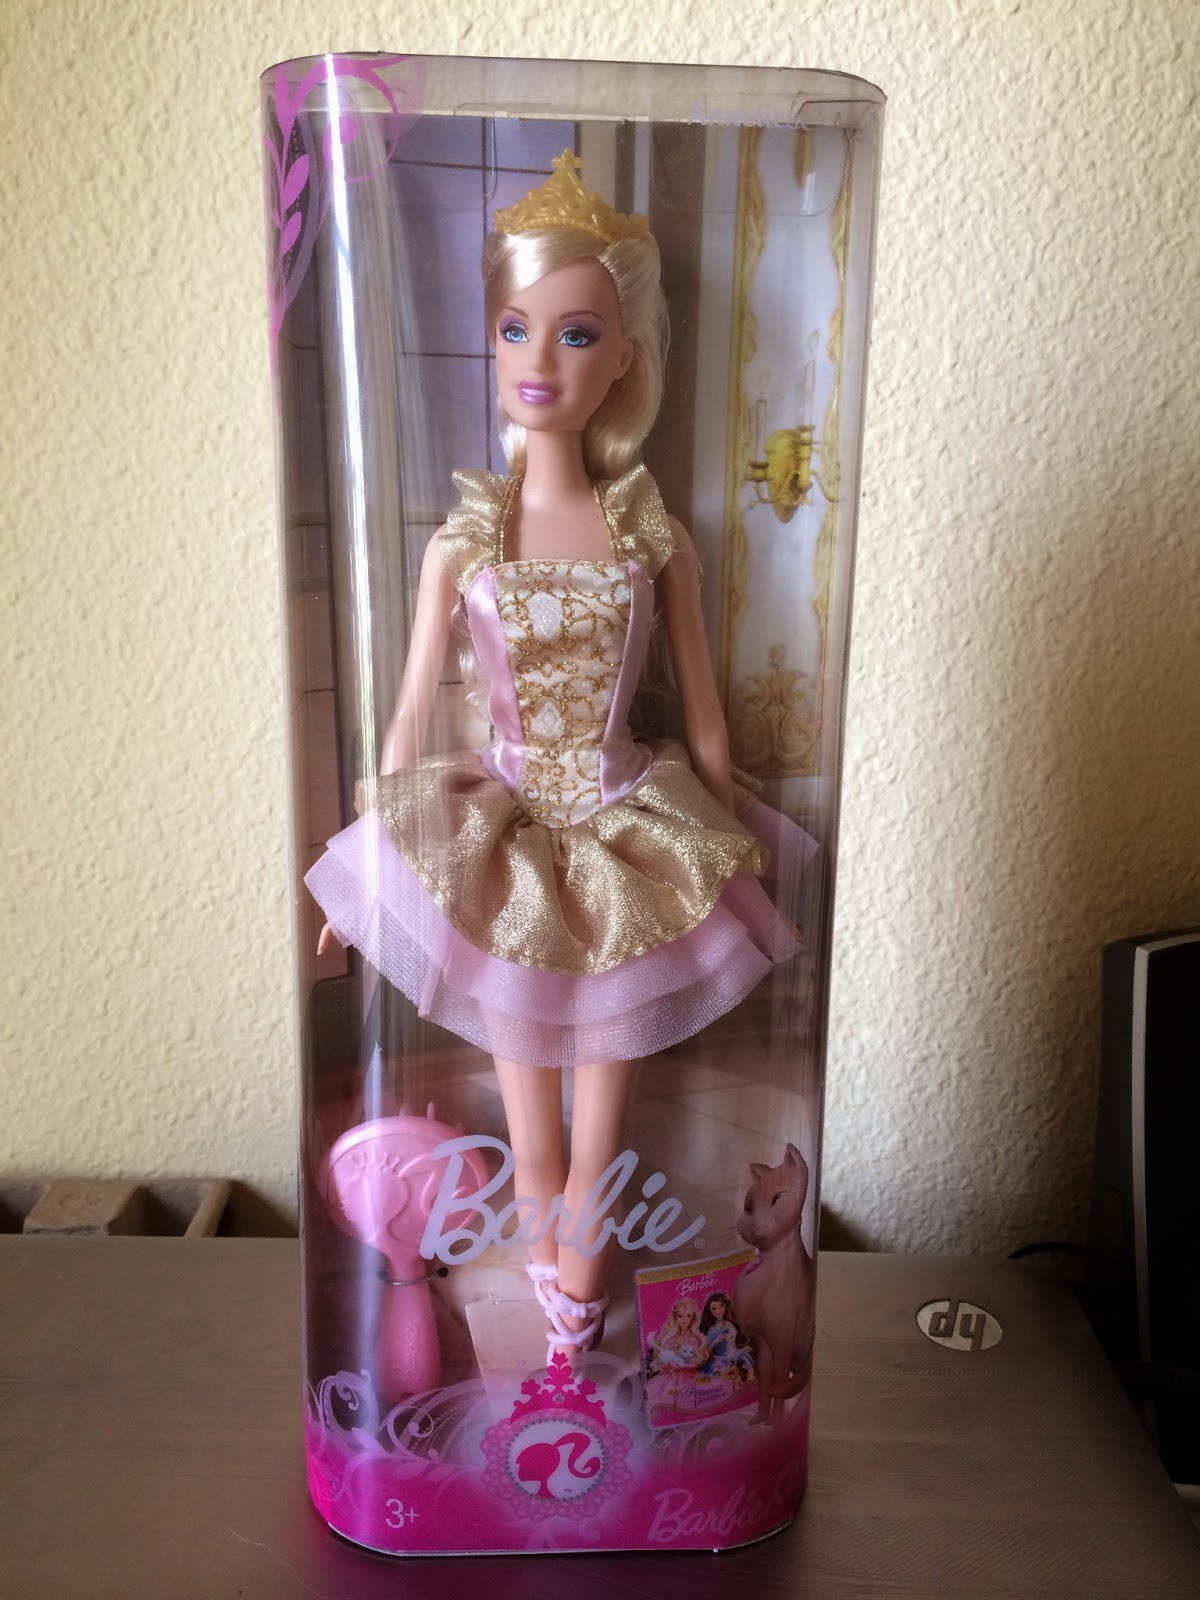 El mundo rosa de barbie barbie princess anneliese - Barbie ballerine ...